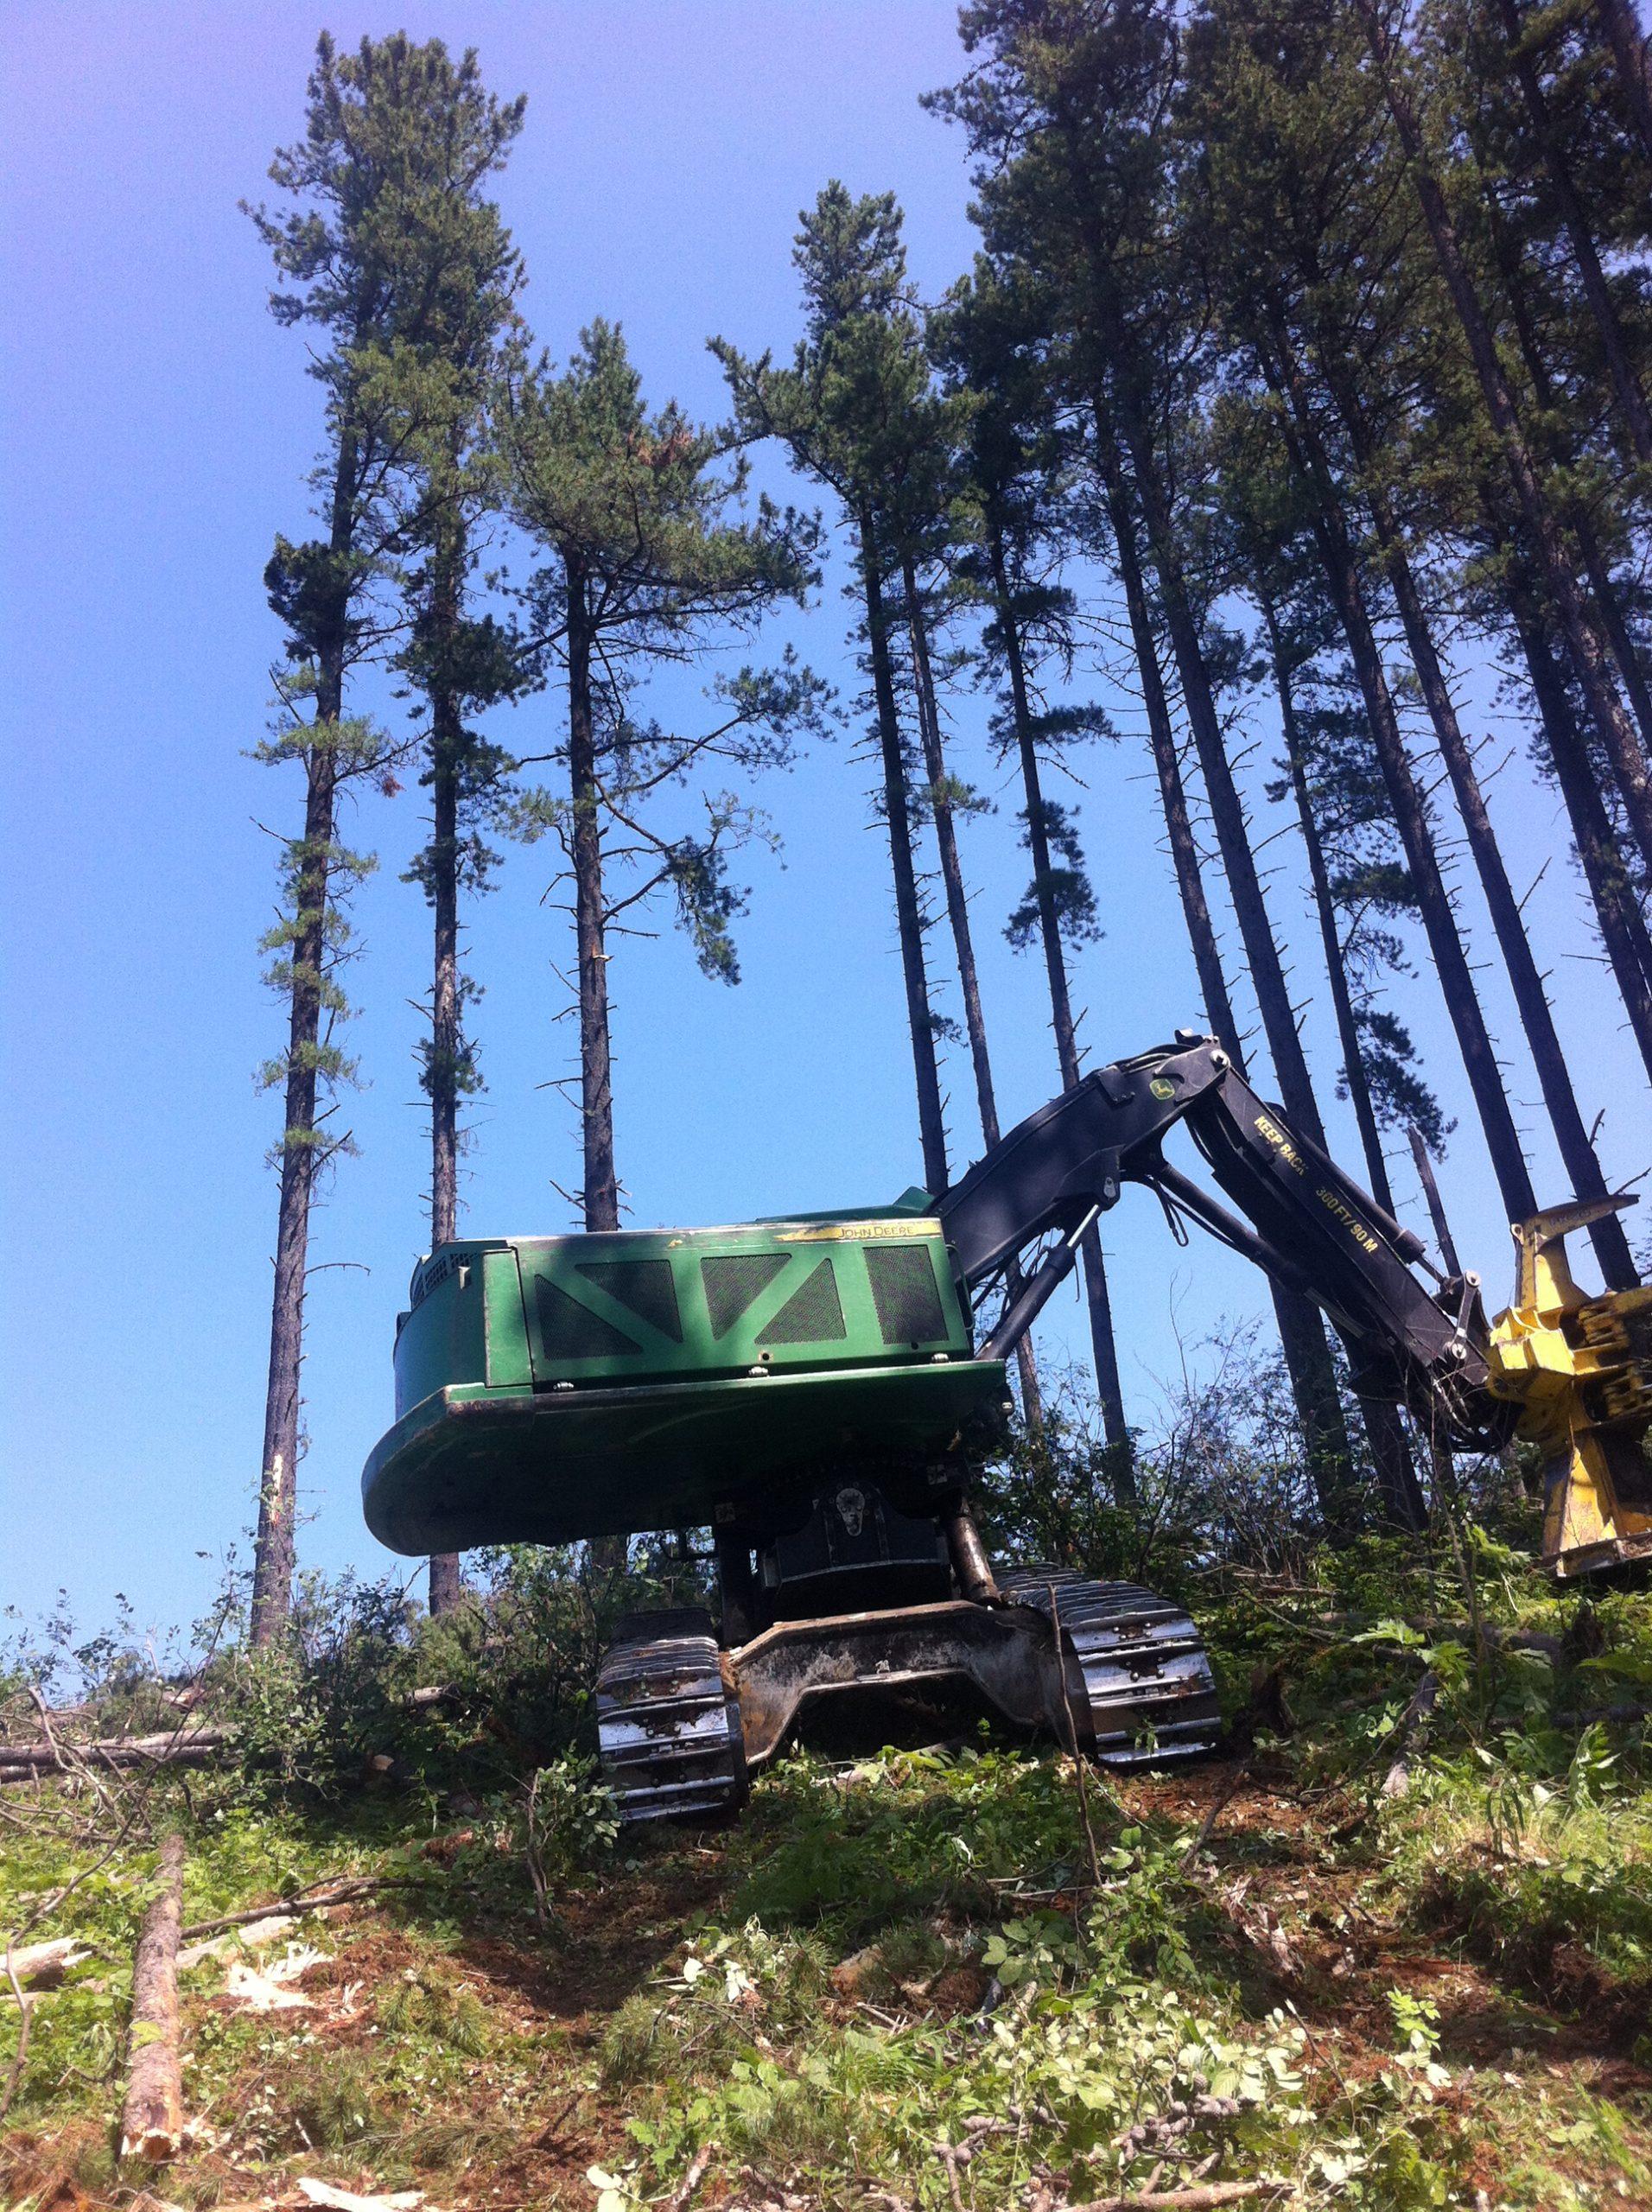 A large machine harvesting pine trees